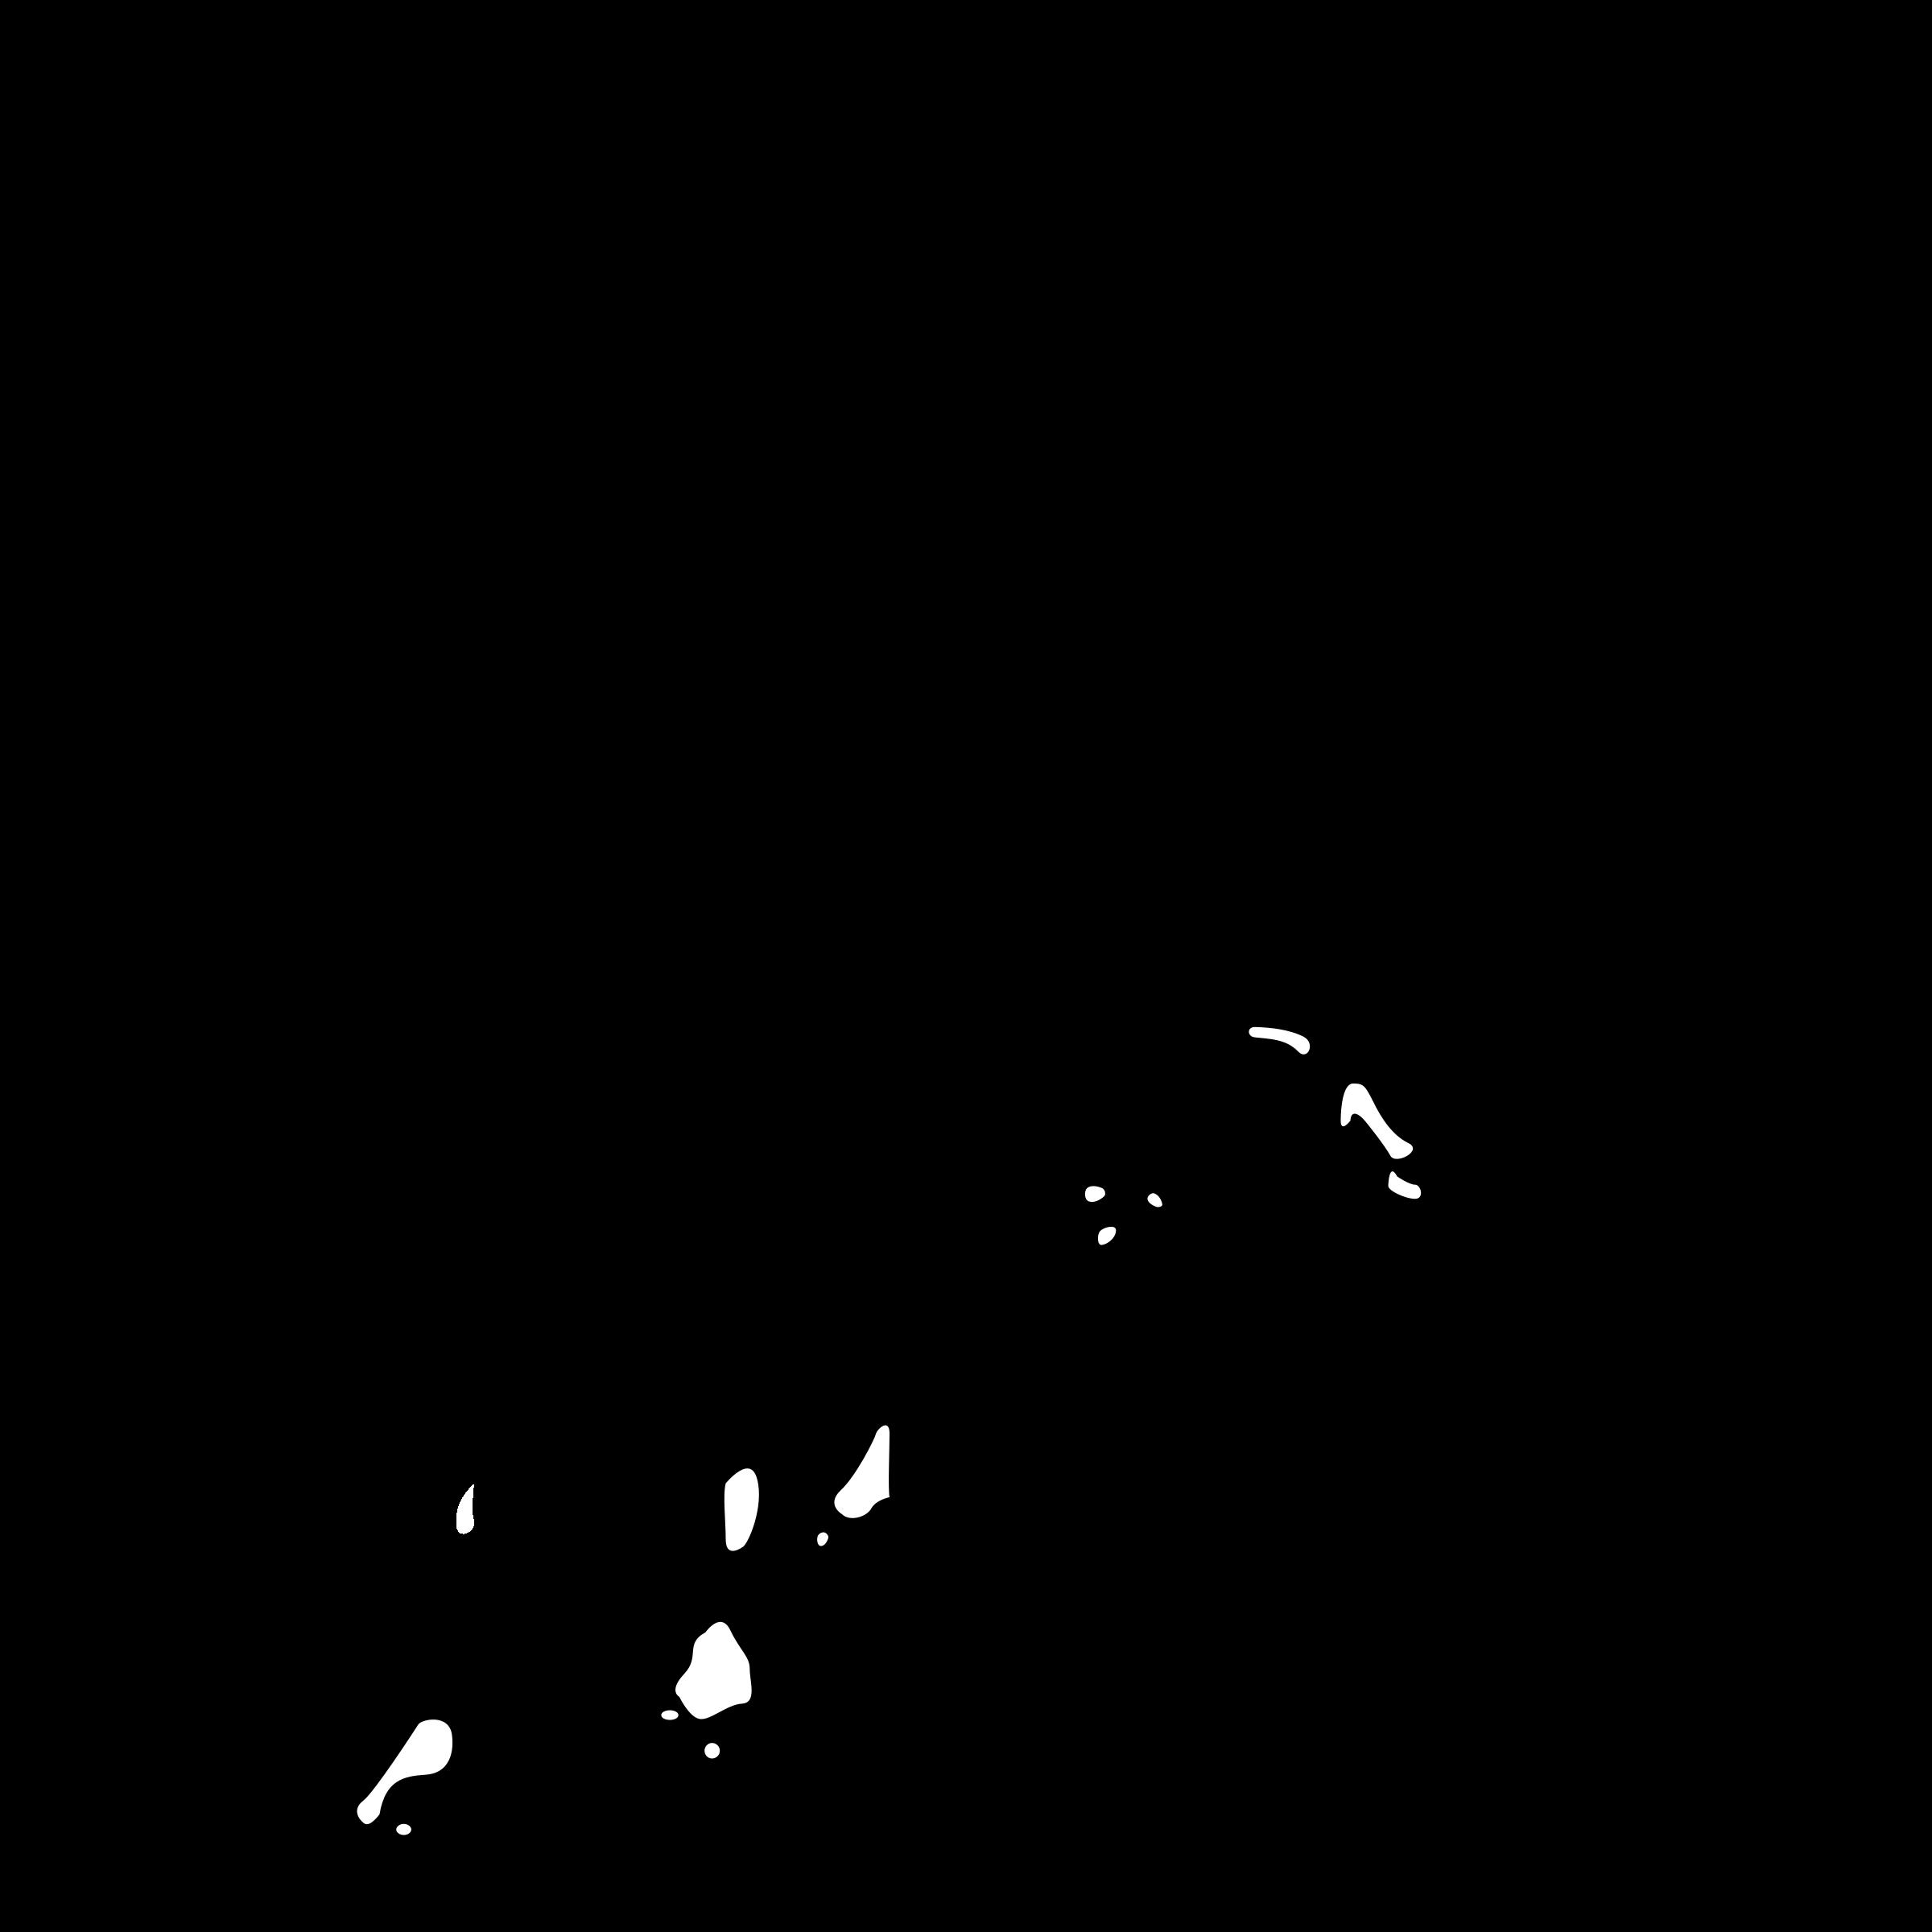 Longhorn clipart vector. Lamborghini logo png transparent